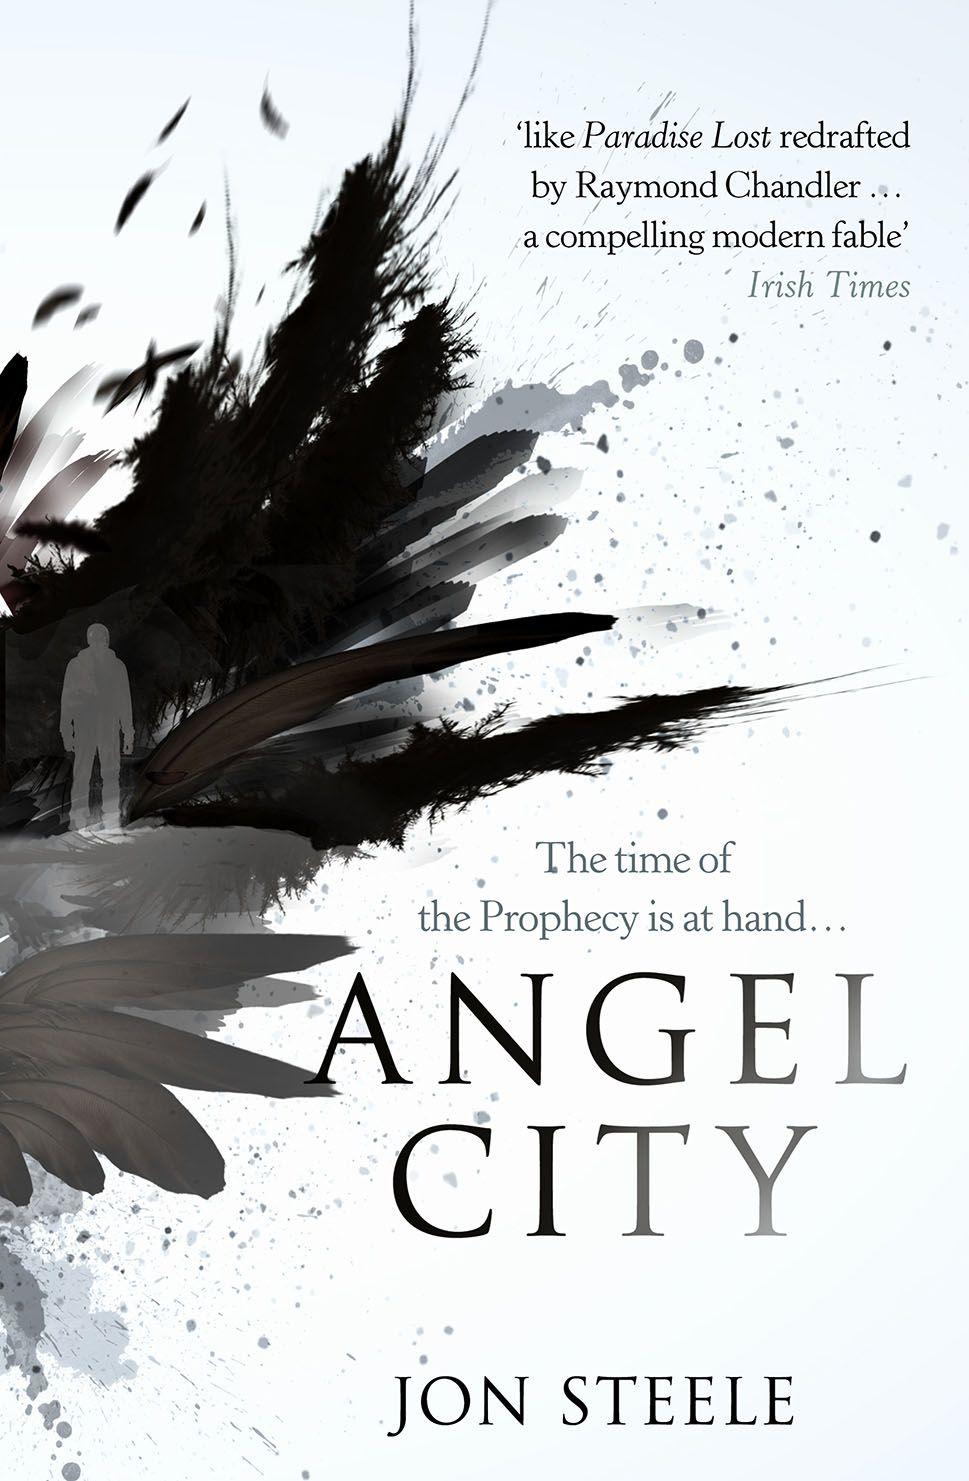 ANGEL CITY JON STEELE © Stephen Mulcahey / Arcangel Images